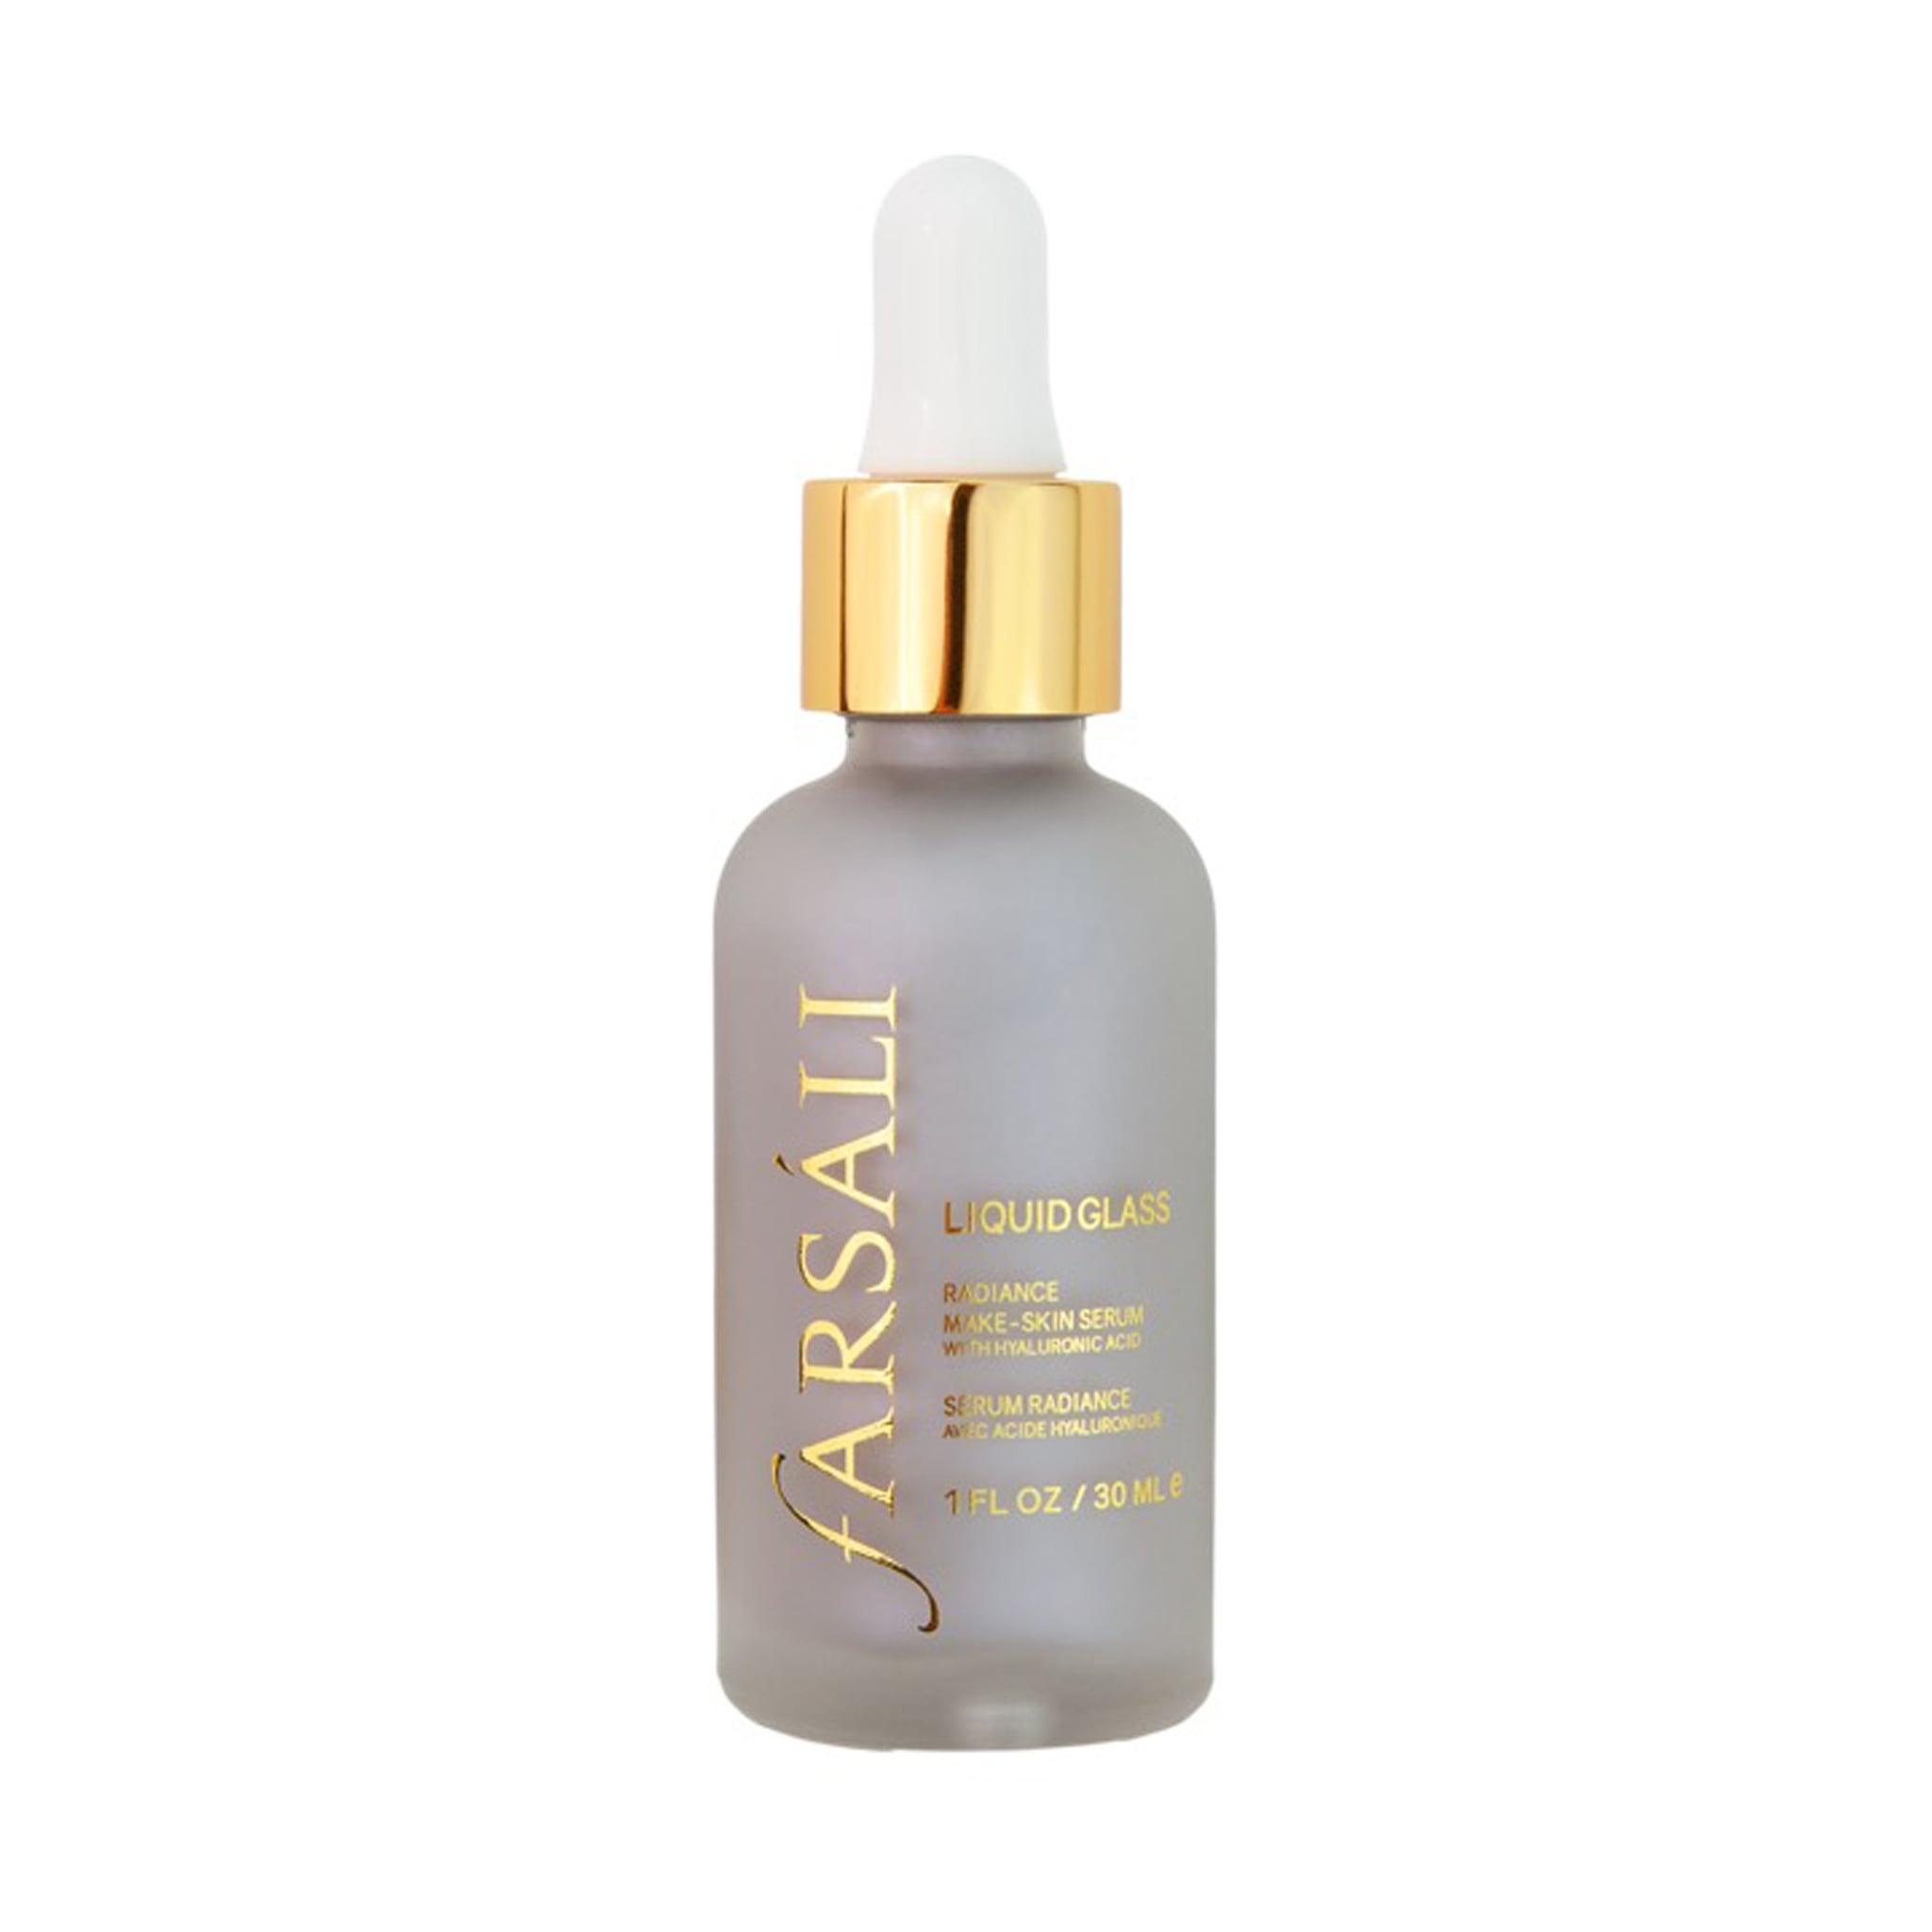 Farsali Liquid Glass Radiance Make-Skin Serum